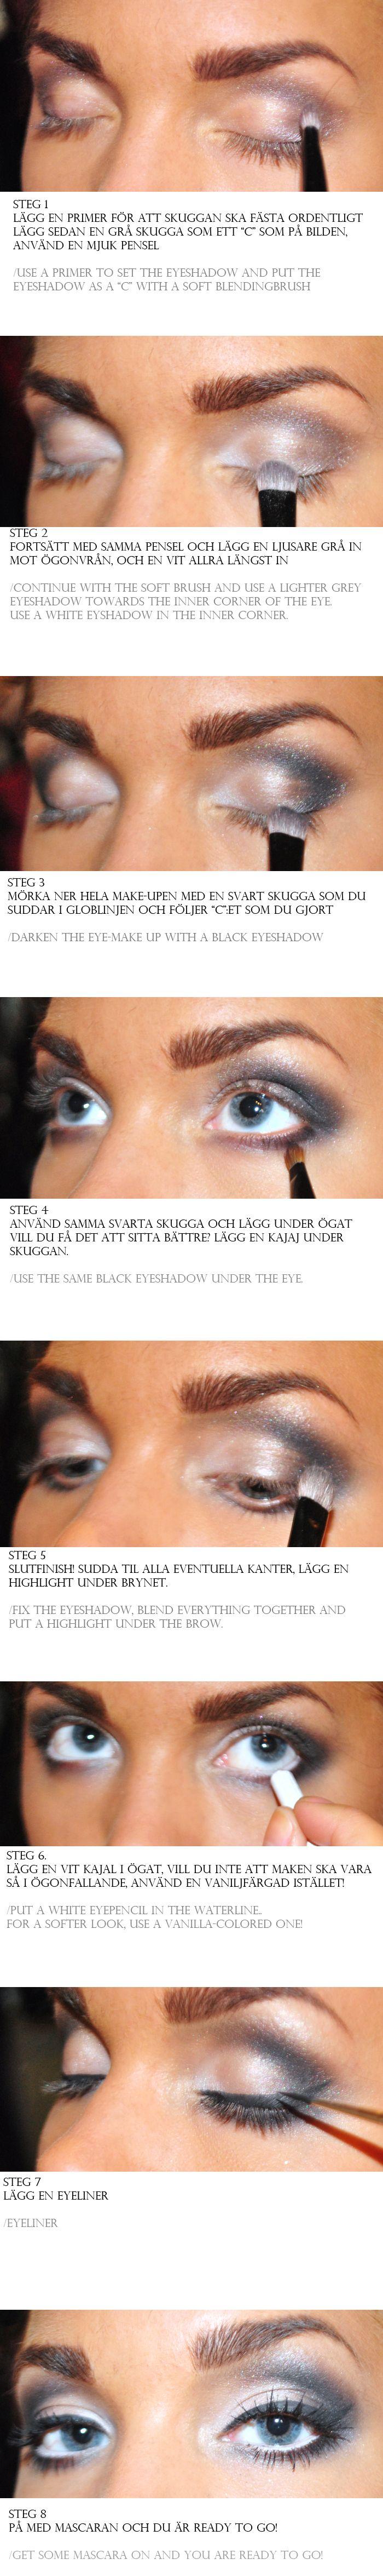 Smoky look tutorial  http://www.lindahallberg.se/2012/07/make-up-tutorial-smoky-look/tutsot/